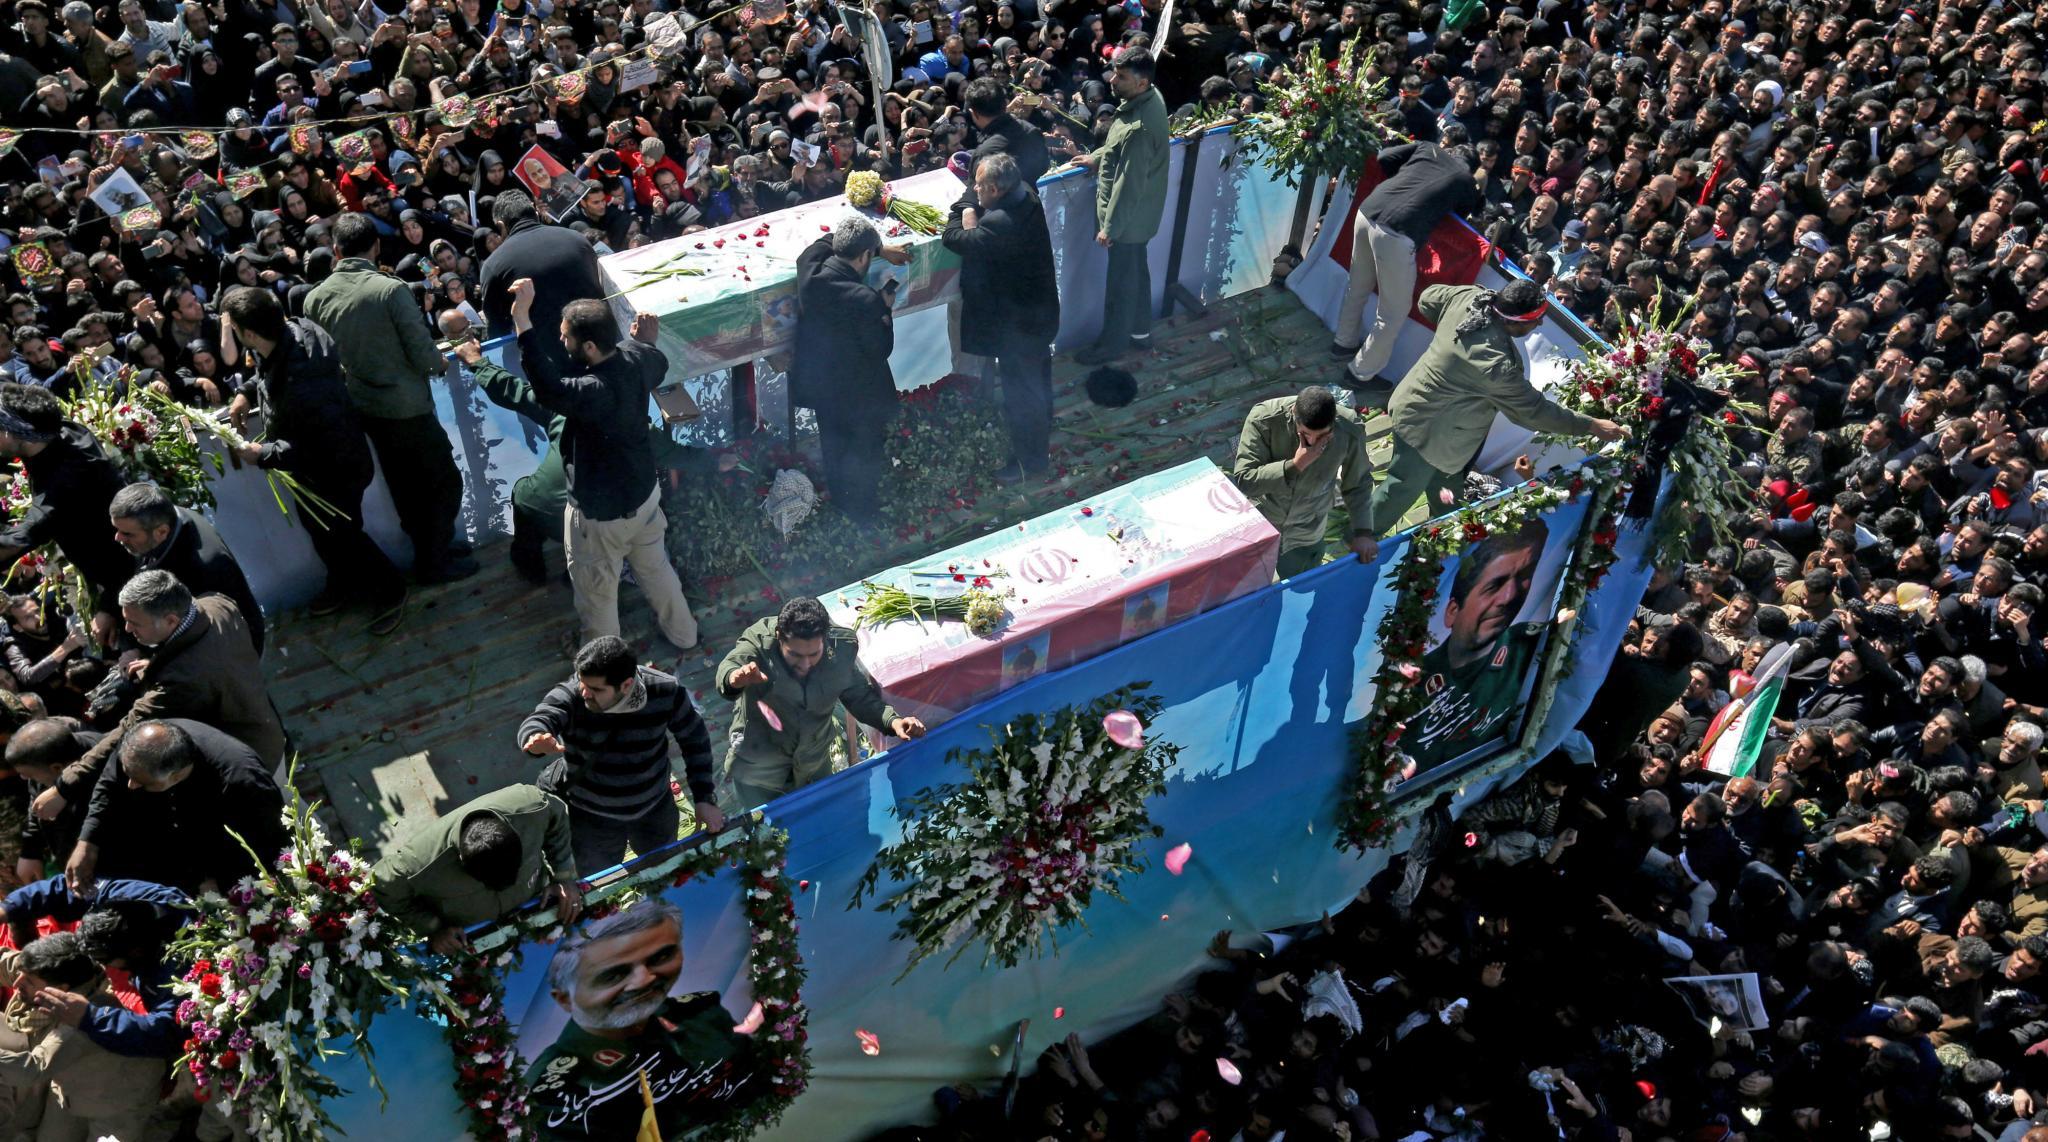 Iran Stampede Kills 32 at Funeral for General Qasem Soleimani Killed by US